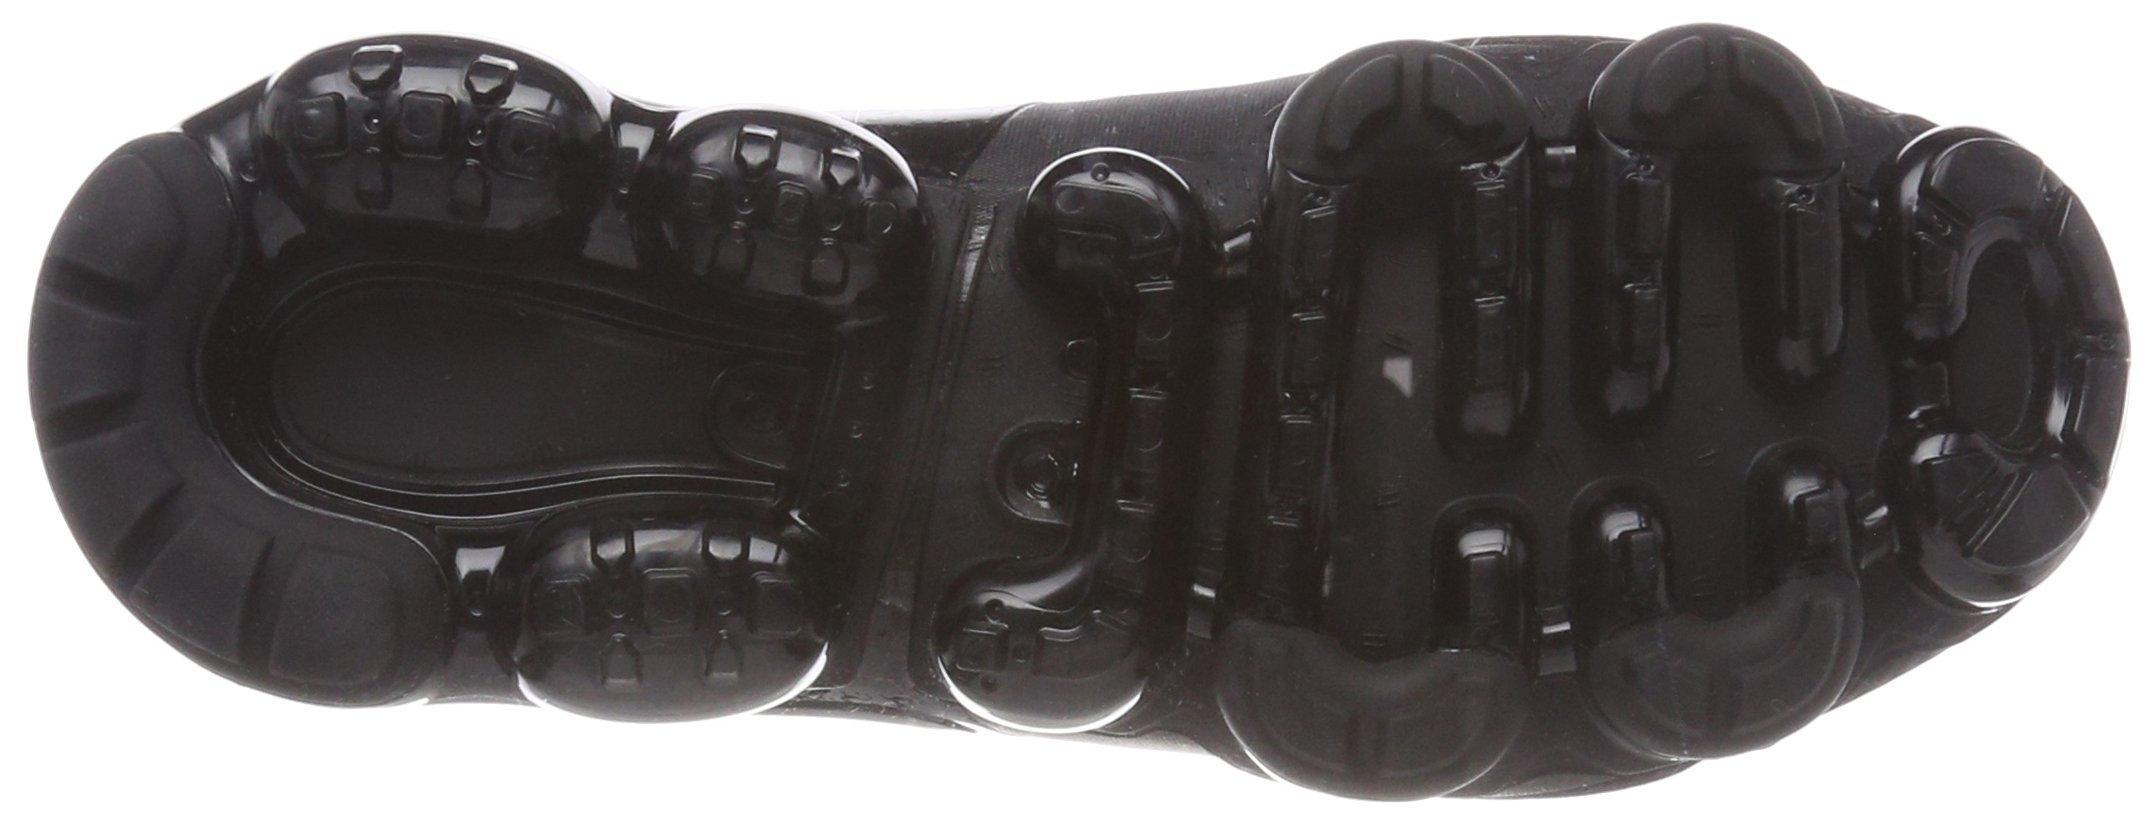 NIKE Kids' Grade School Air Vapormax Running Shoes (Black/Black/Black,5) by NIKE (Image #3)